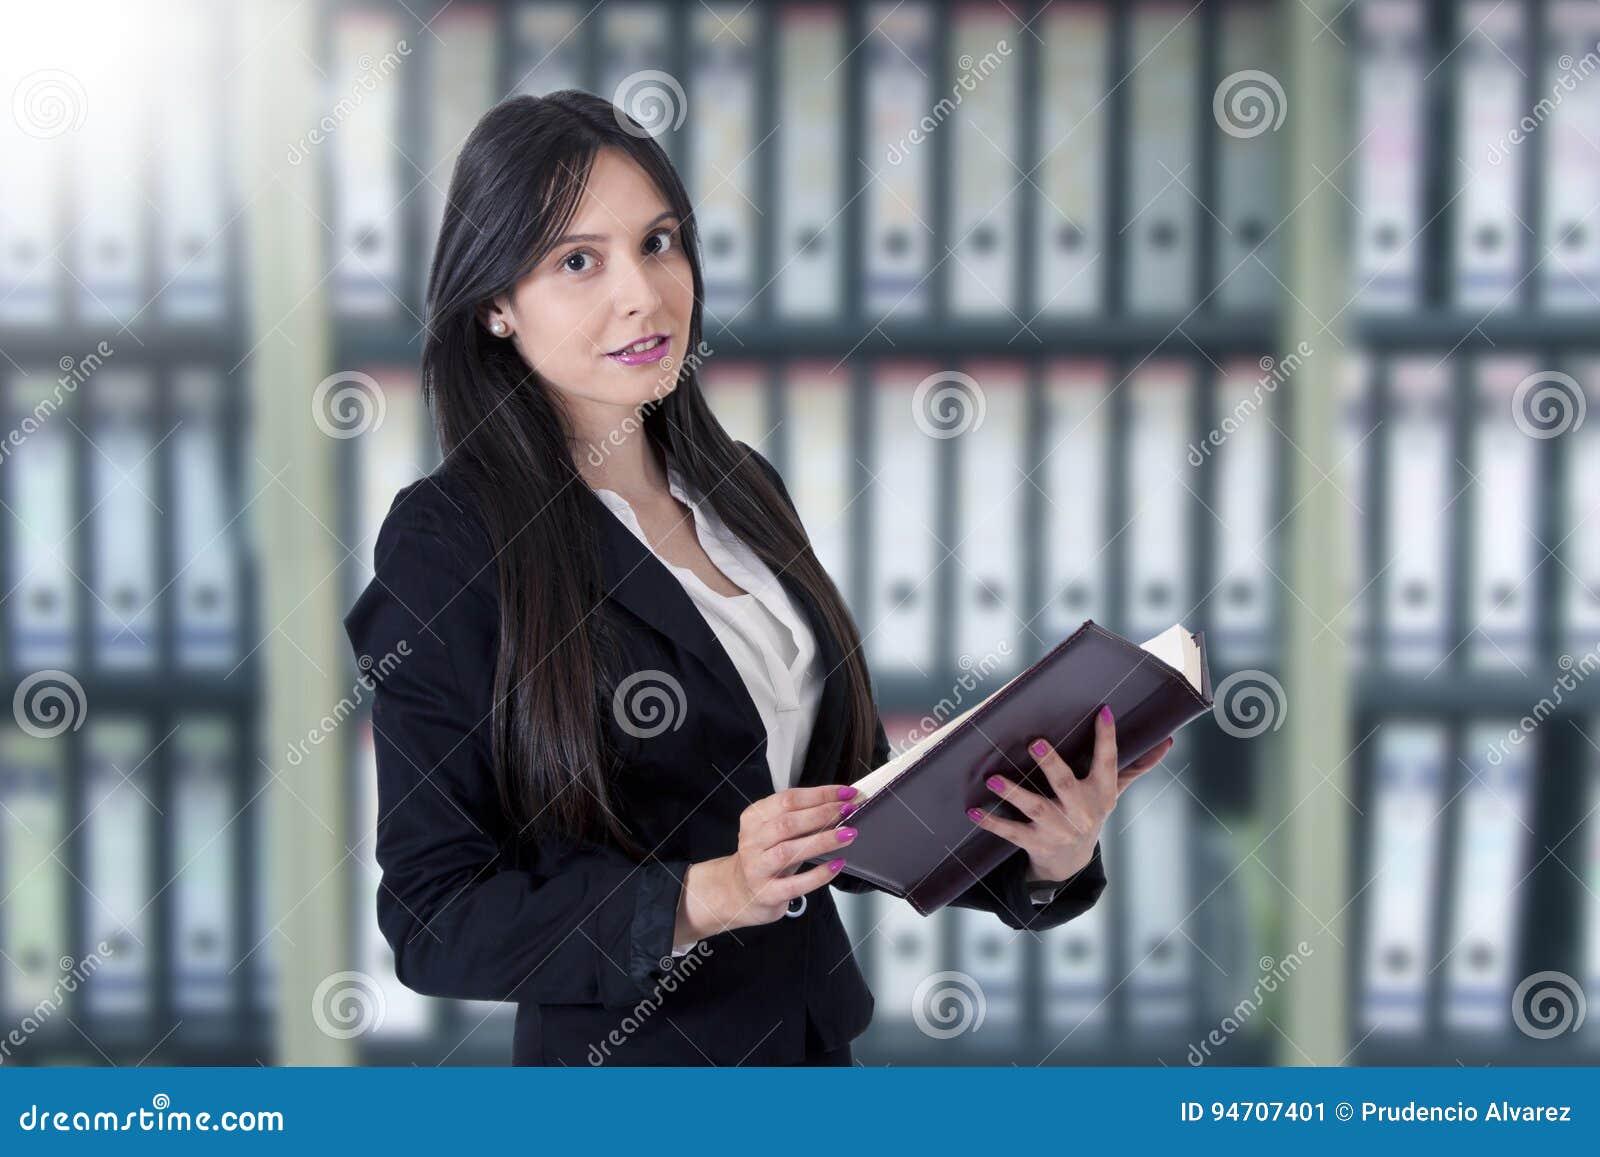 Businesswoman with address book